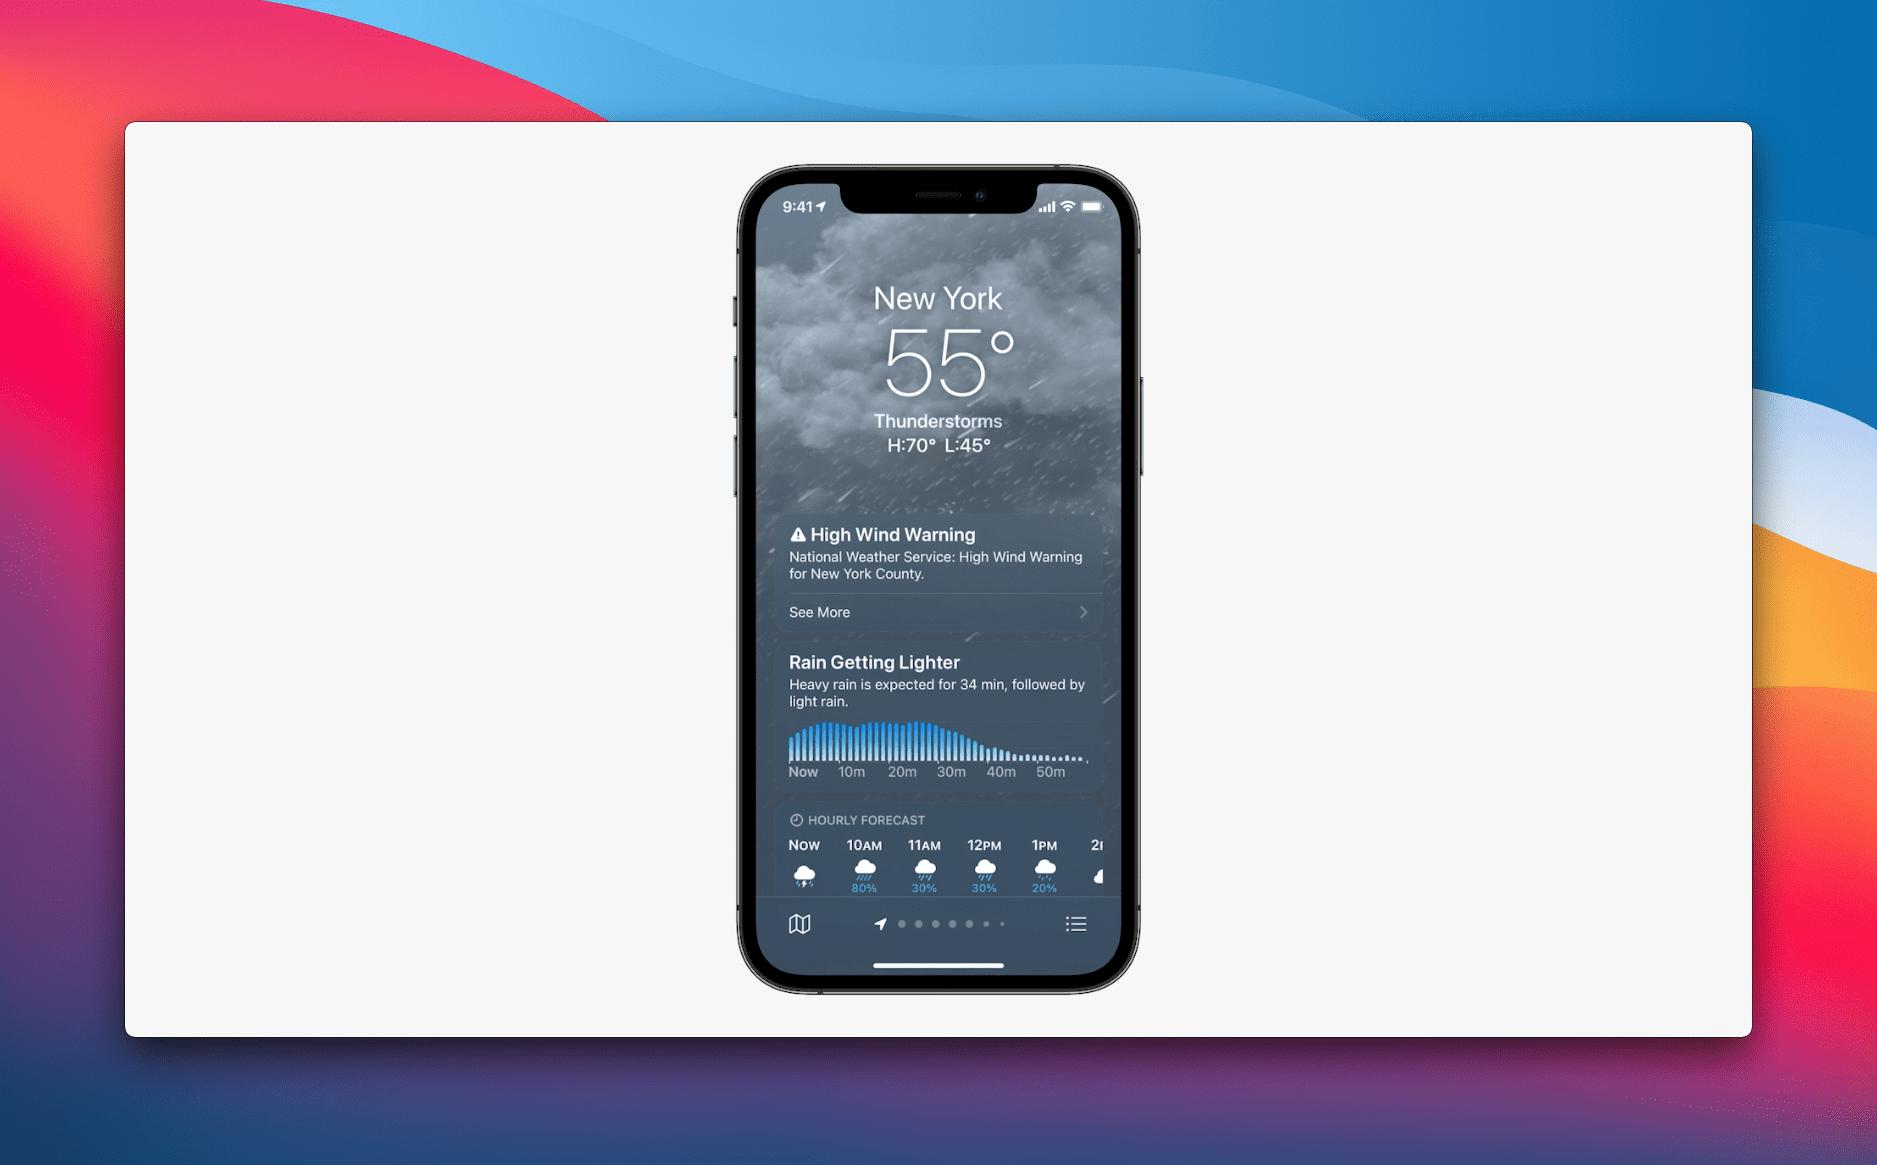 Weather App Changes iOS 15